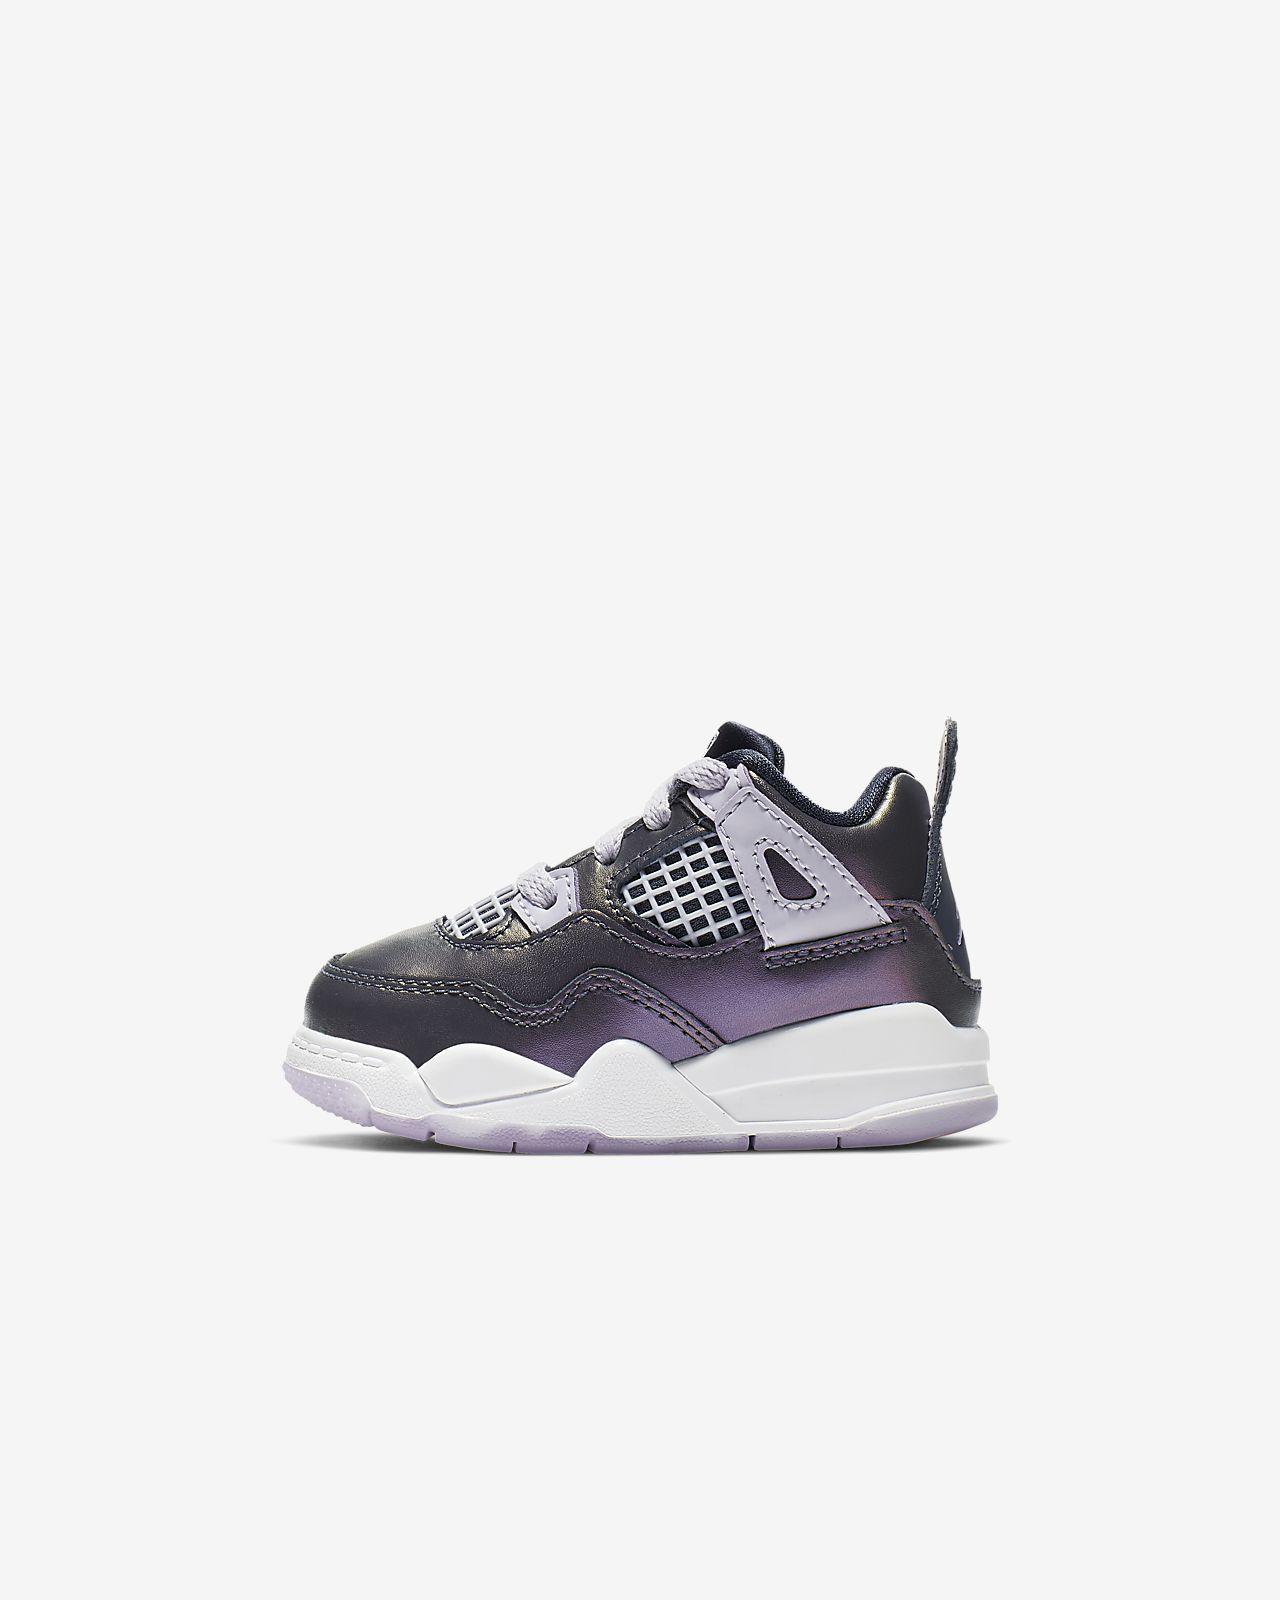 Jordan 4 Retro SE(TD) 复刻婴童运动童鞋